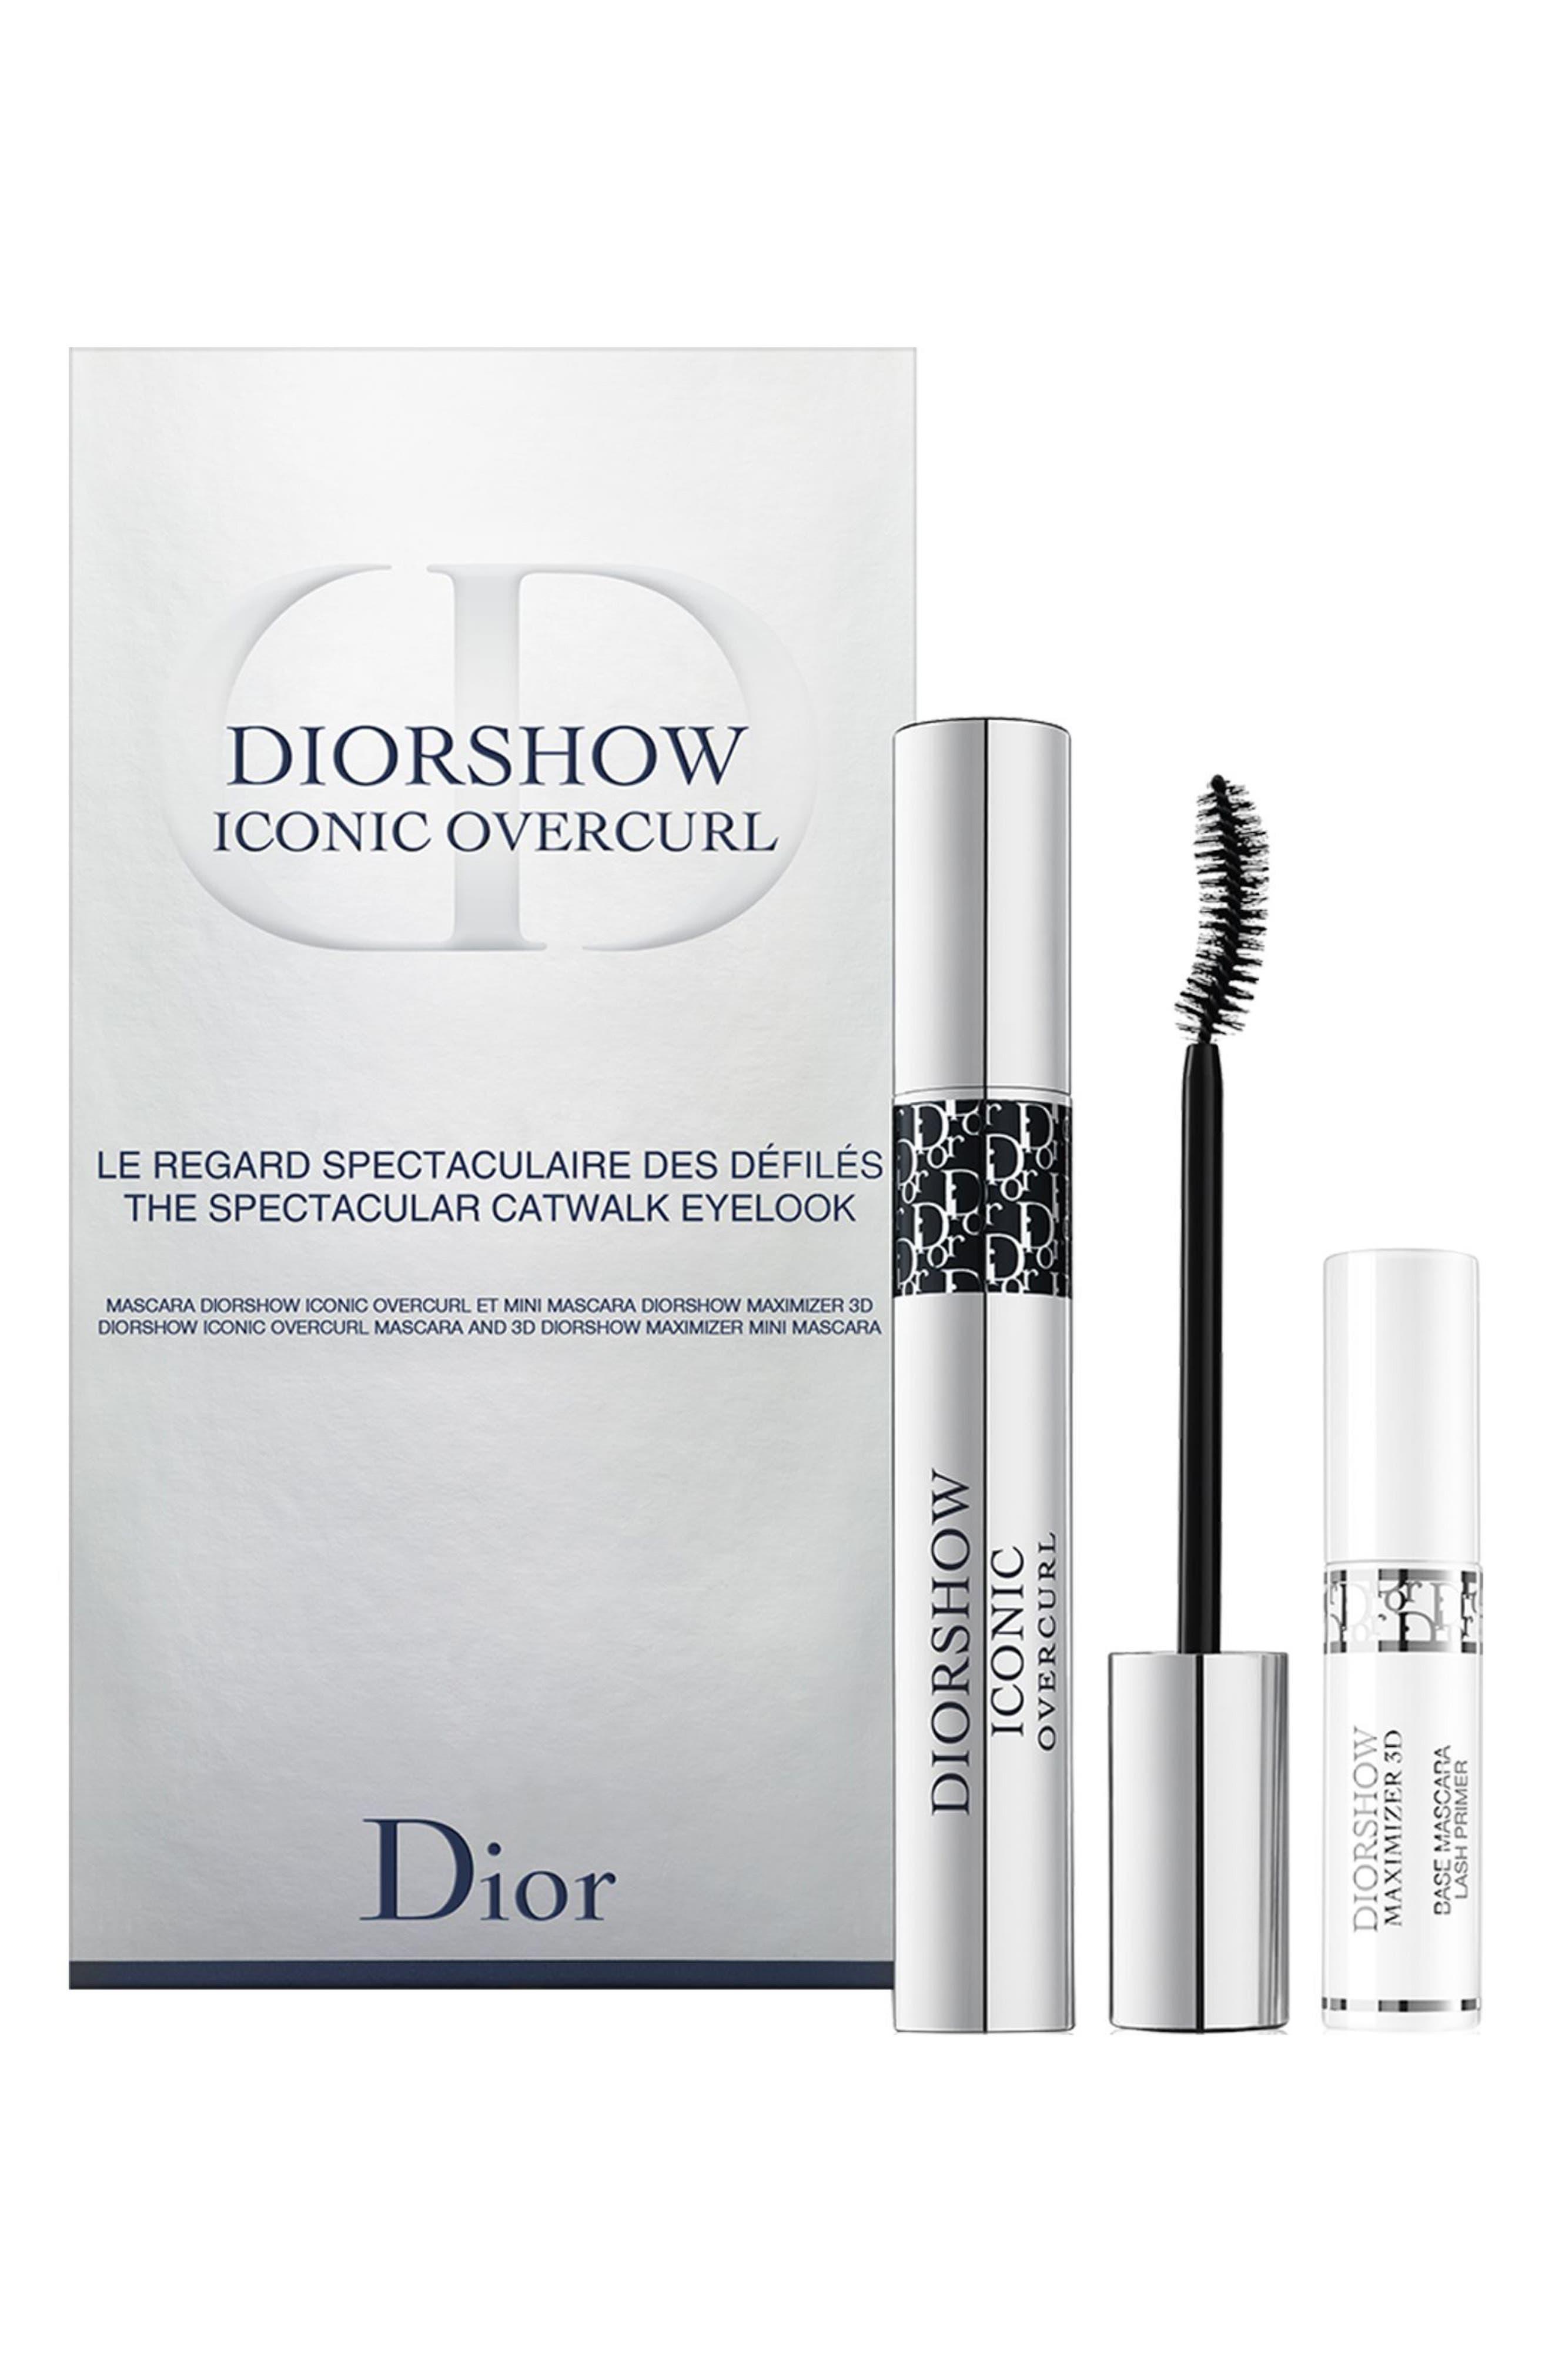 Diorshow Iconic Overcurl The Spectacular Catwalk Mascara Set,                             Main thumbnail 1, color,                             001